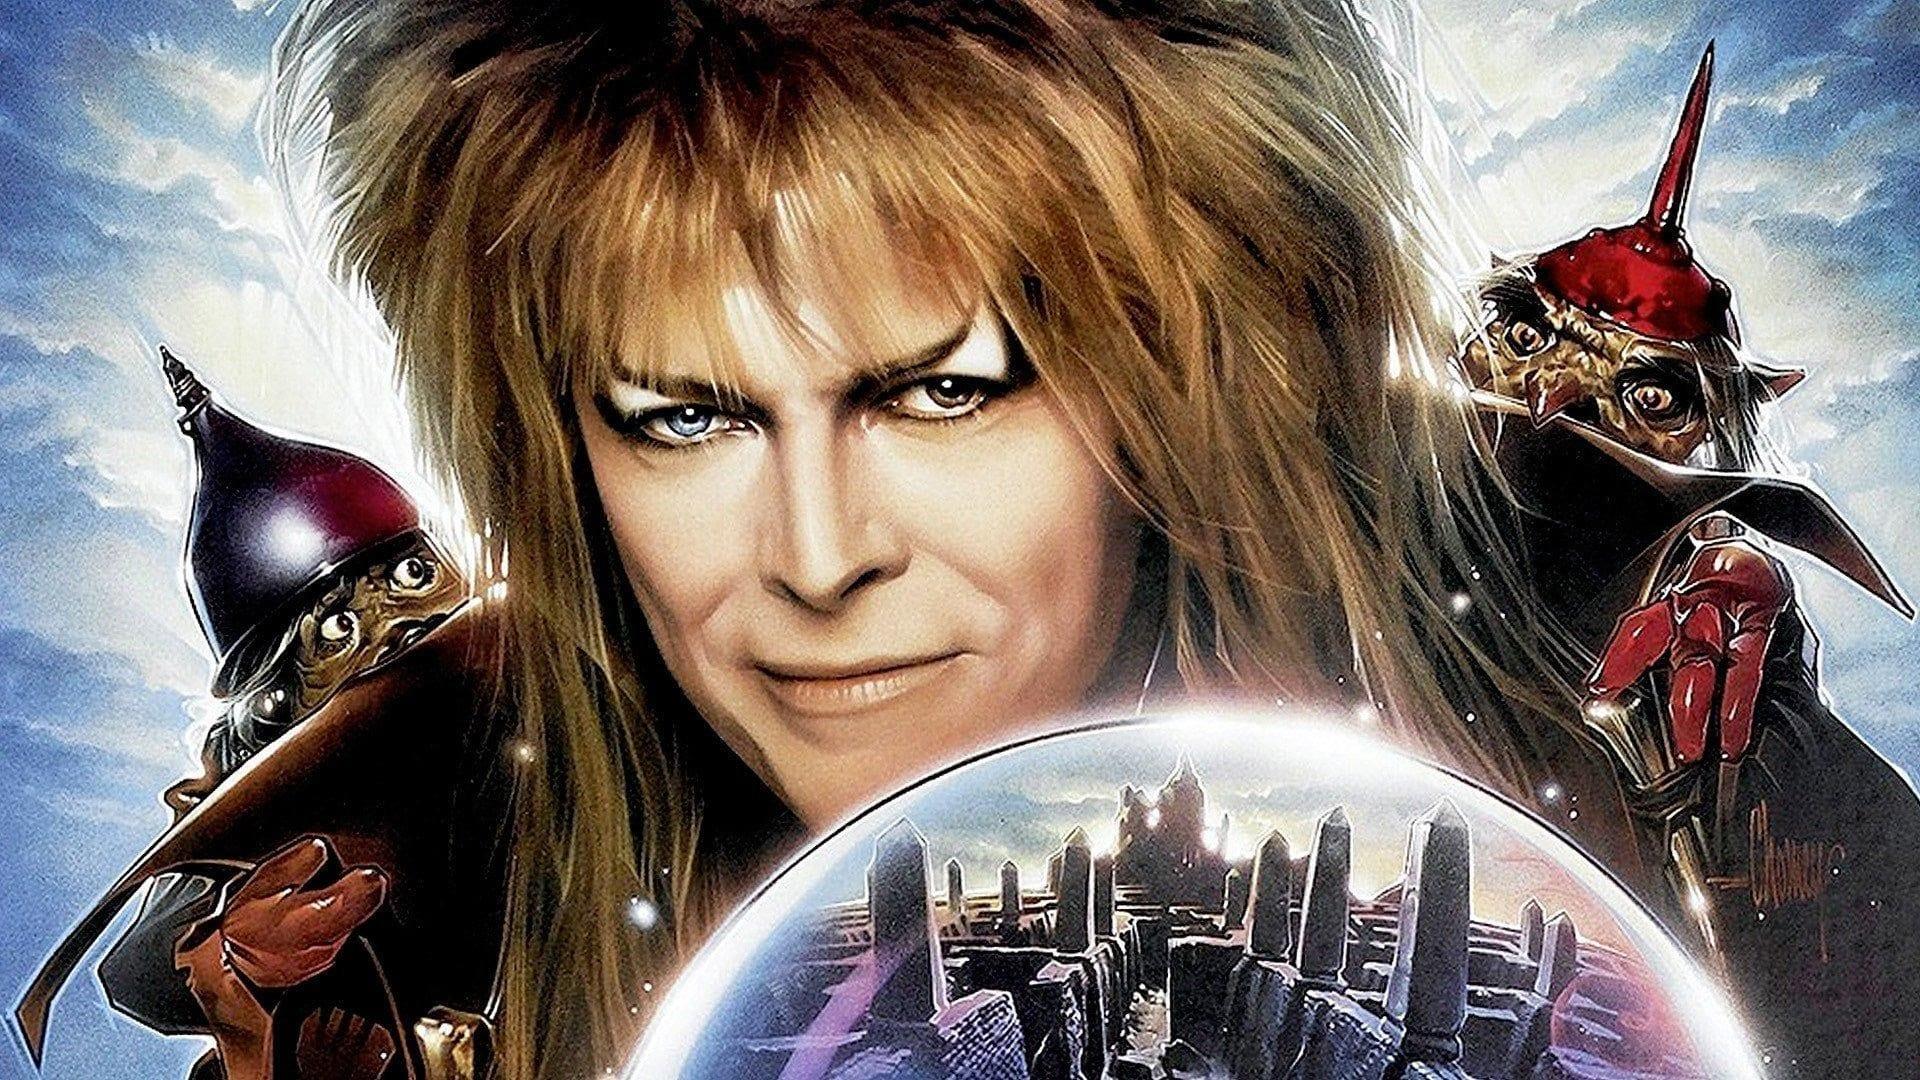 Labyrinth: sarà Scott Derrickson a dirigere il sequel